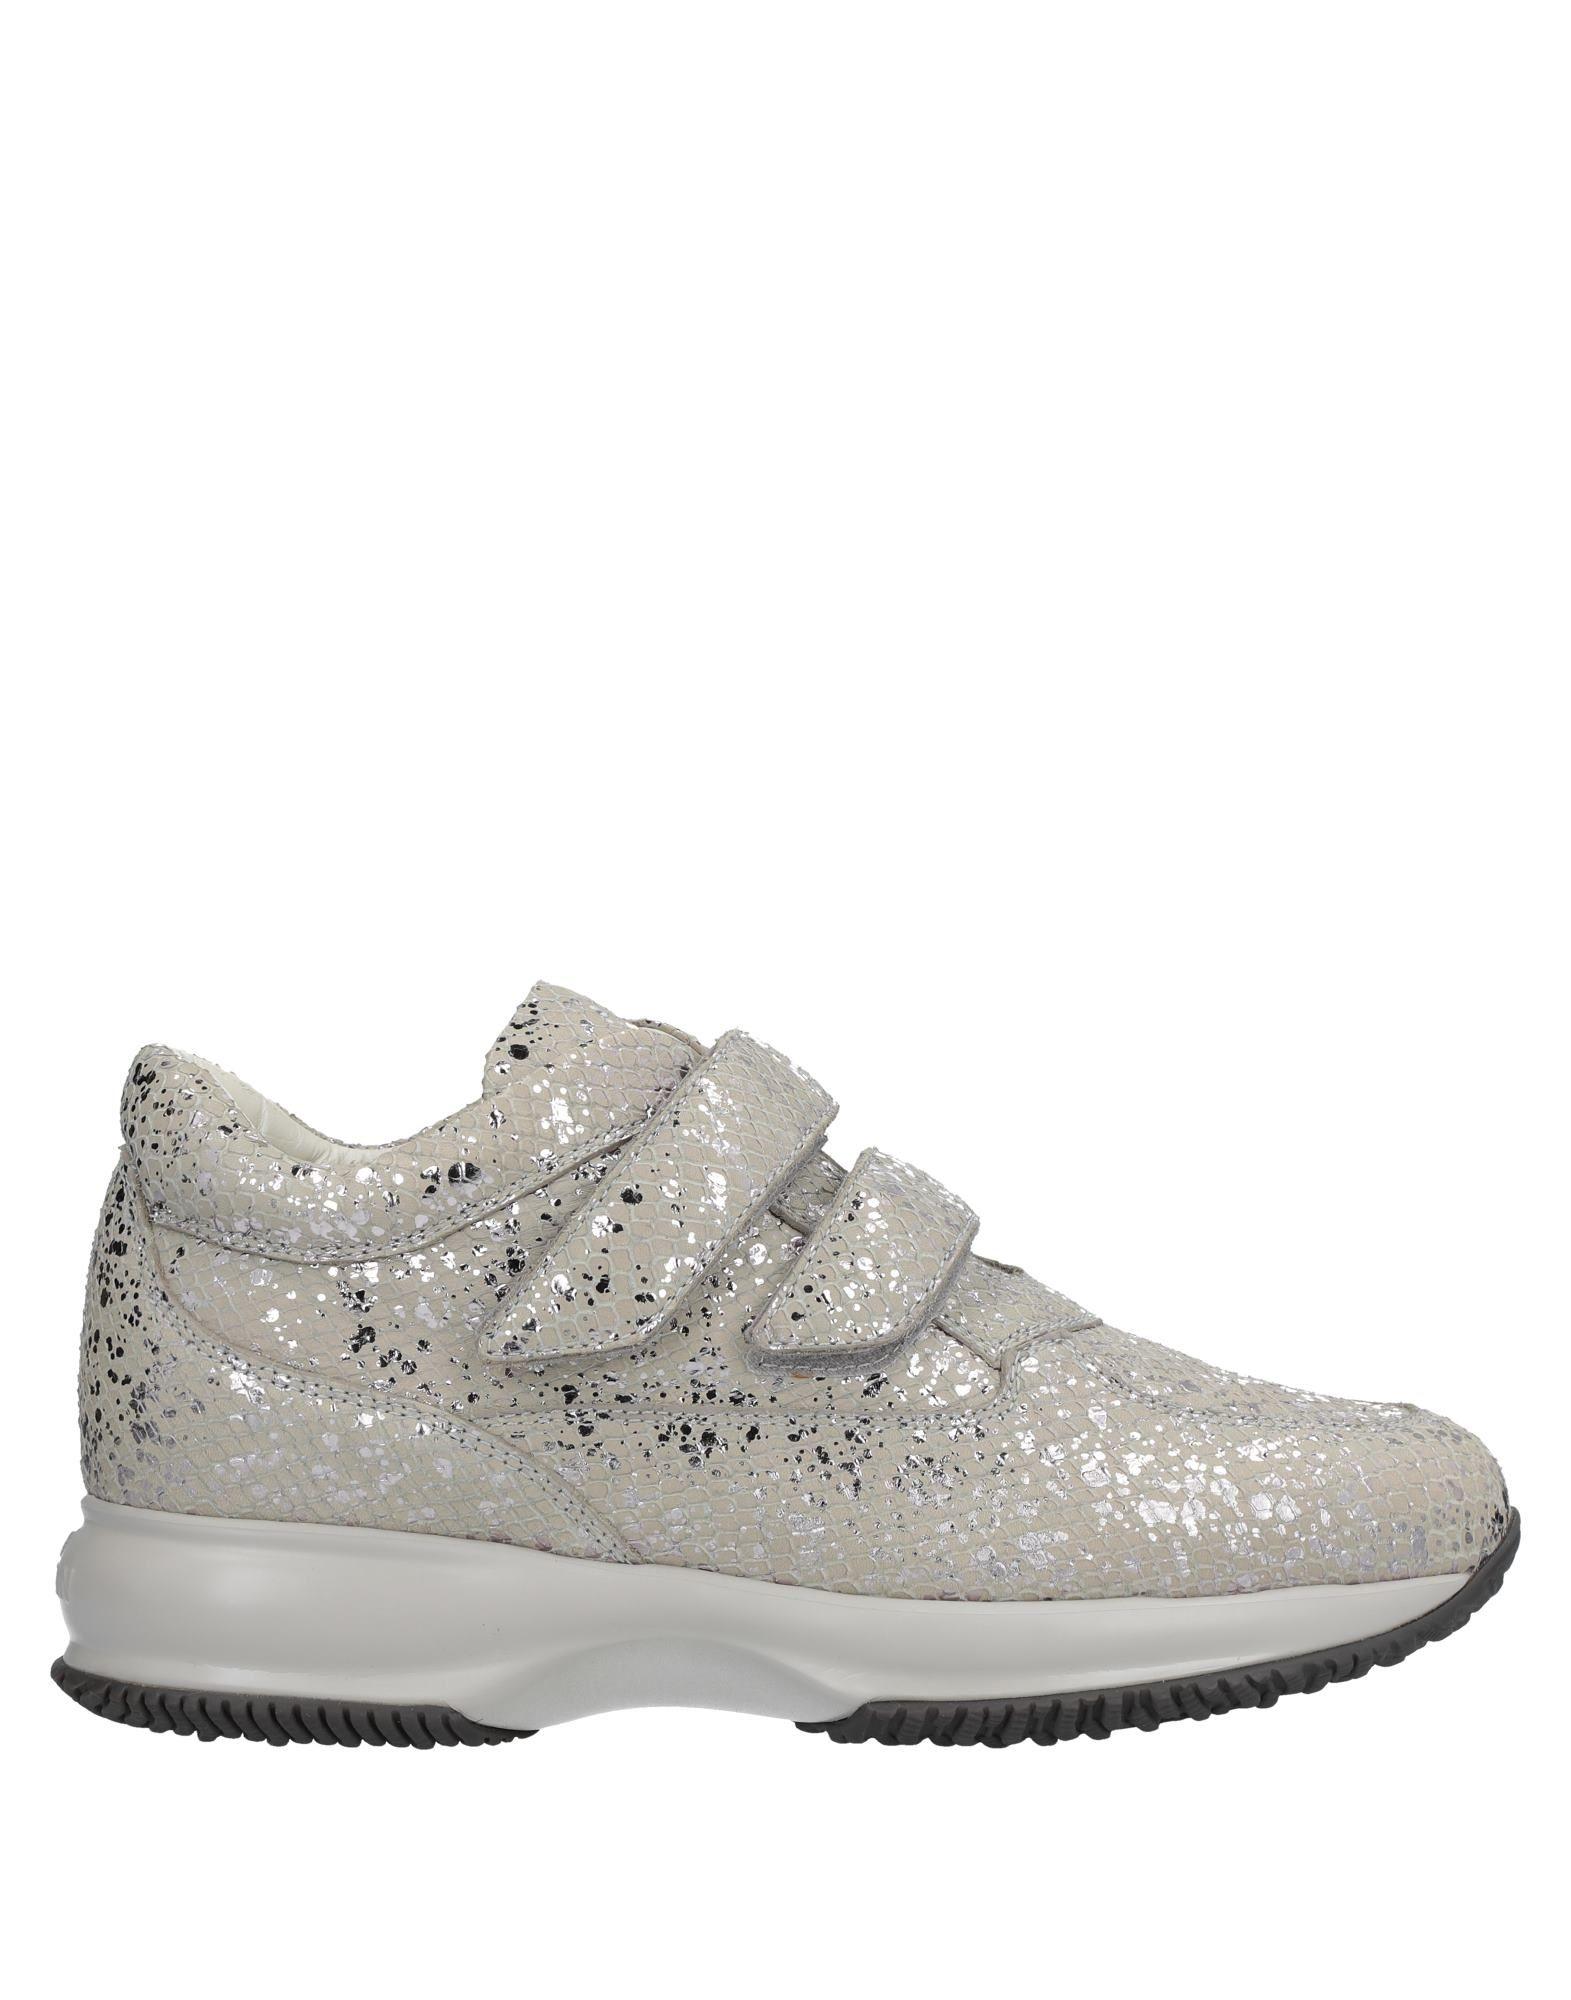 Moda Sneakers Hogan Donna - 11533809JX